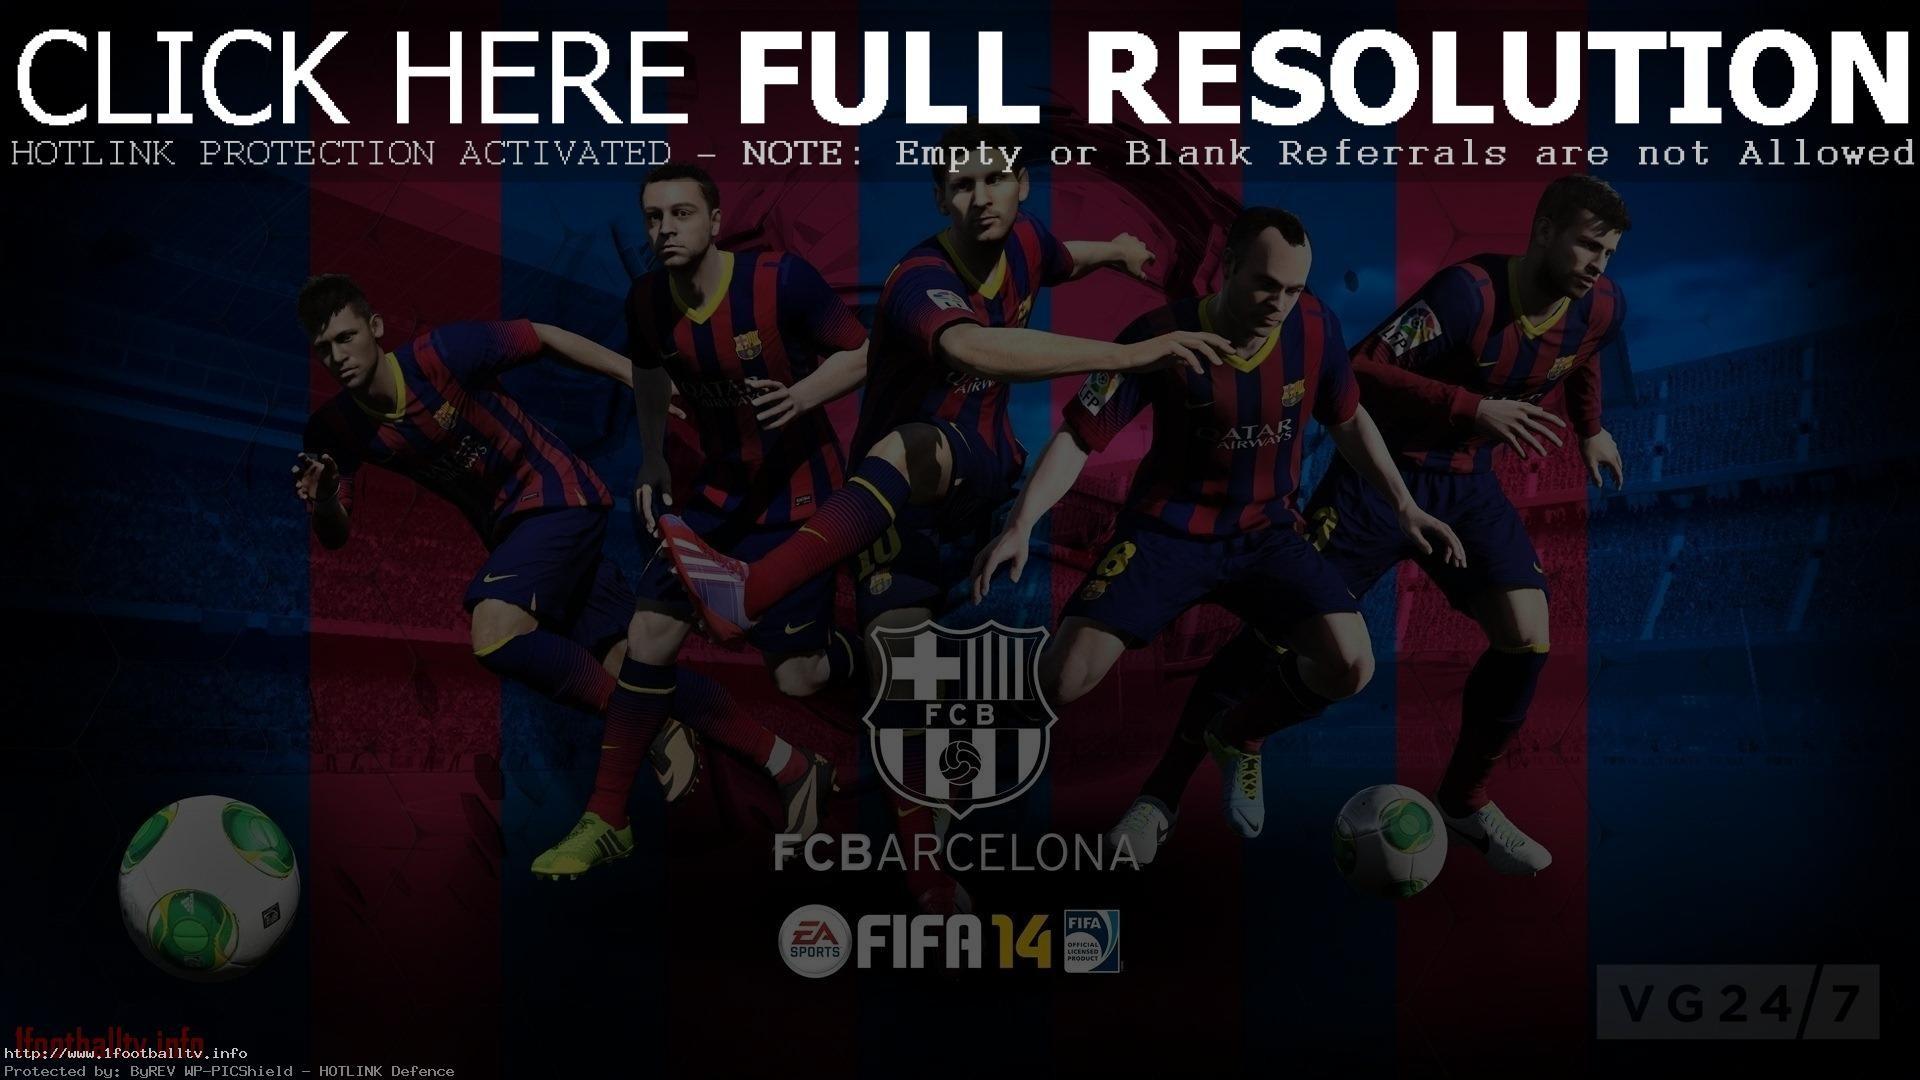 … fc barcelona wallpapers 2017 beautiful fc barcelona fifa football games  wallpaper backgrounds football of fc barcelona …